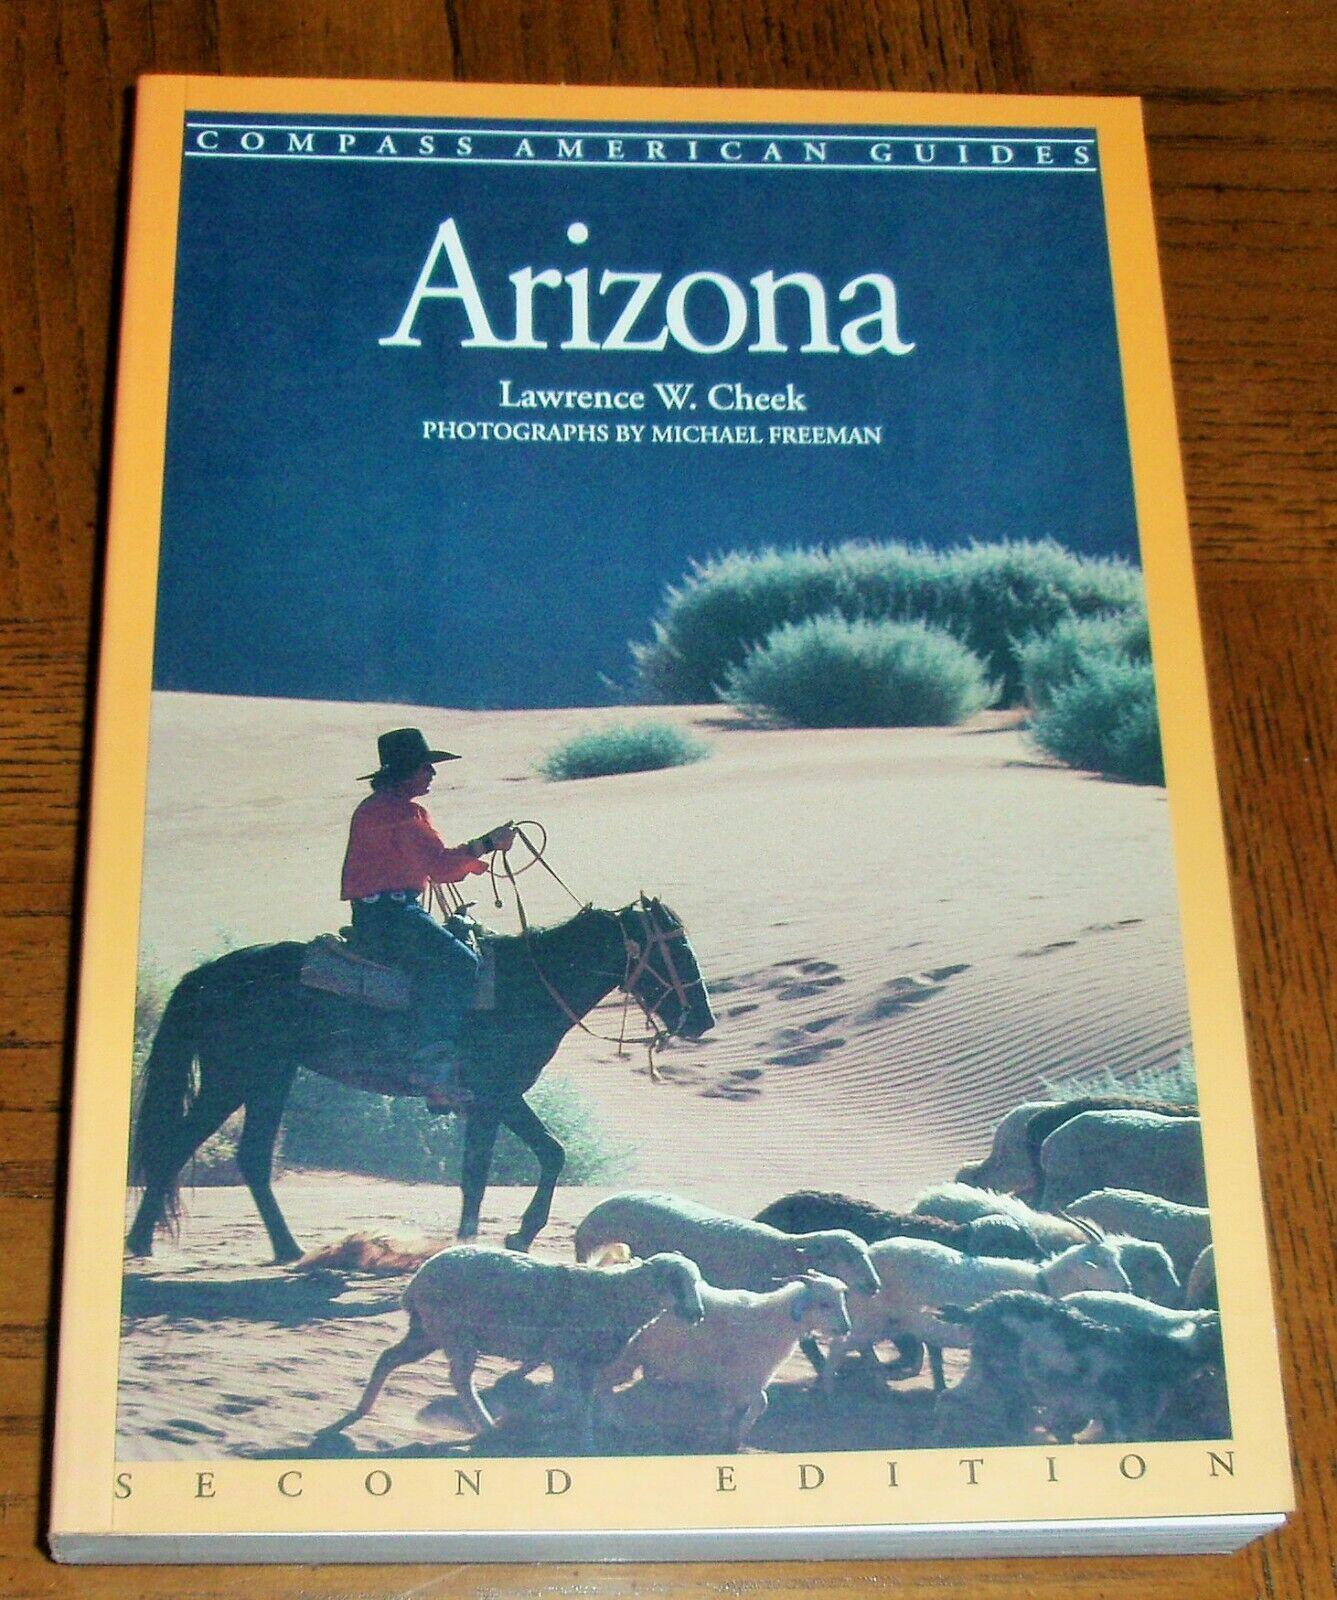 ARIZONA - BOOK BY LAWRENCE W. CHEEK - COMPASS AMERICAN GUIDES SERIES-AMAZING AZ